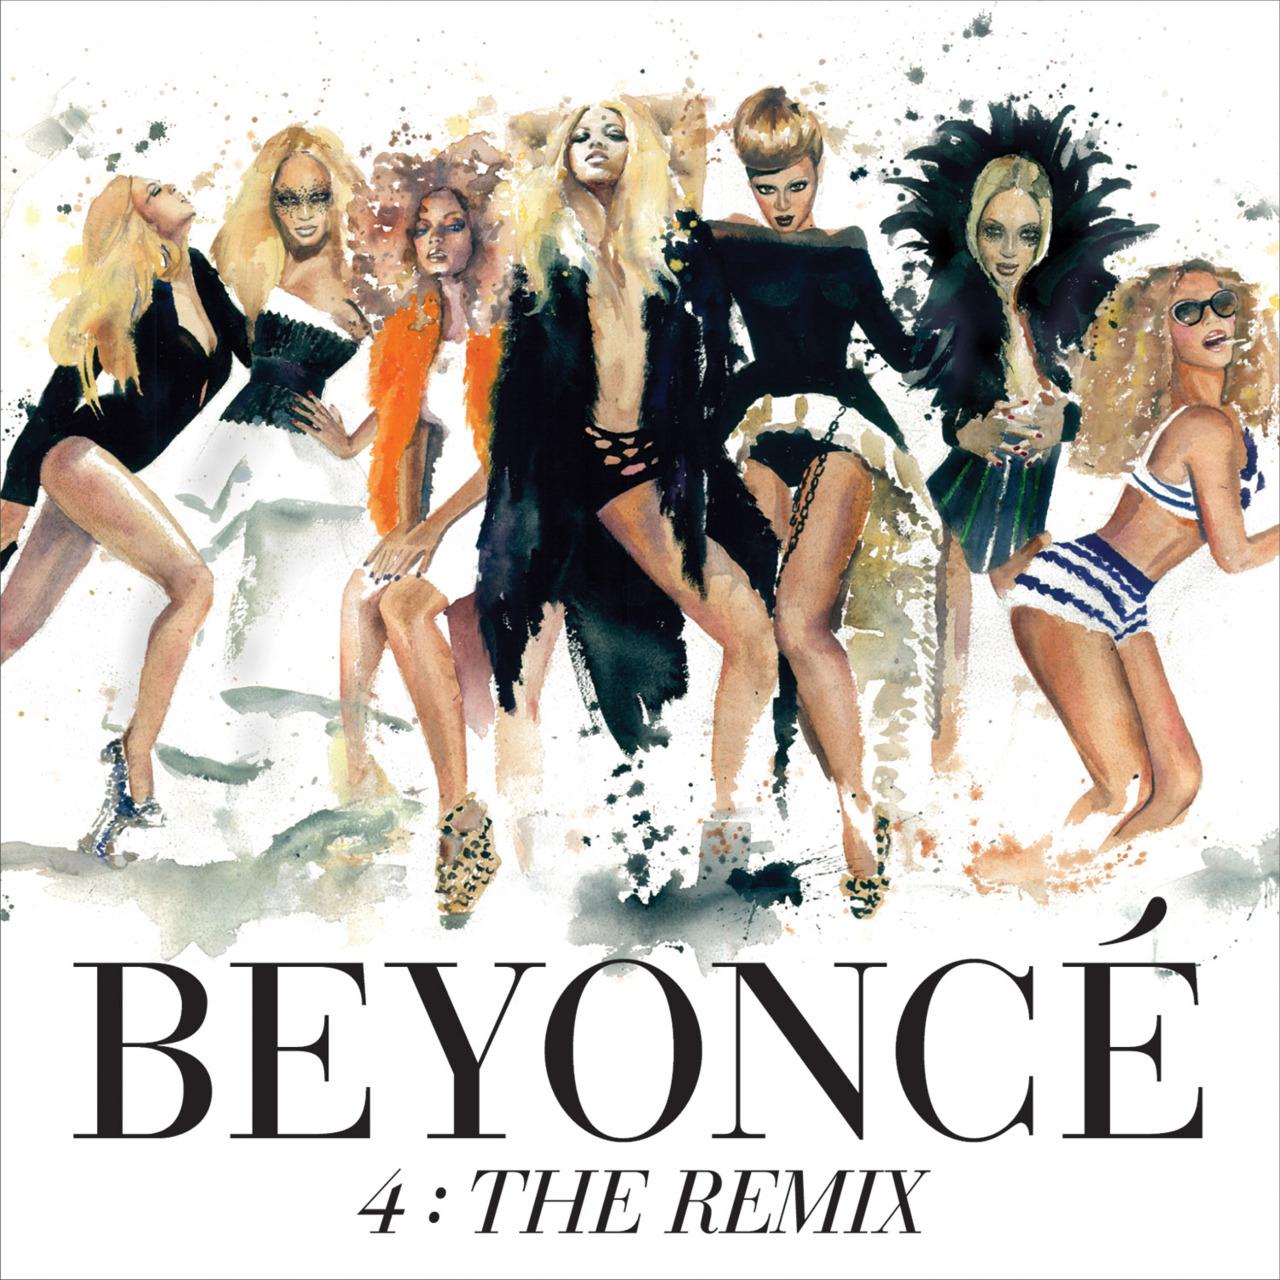 http://1.bp.blogspot.com/-9IHl1BaXf-E/T56BLZEWX2I/AAAAAAAAJMY/7OsJwtW825o/s1600/Beyonce+4+remix.jpg